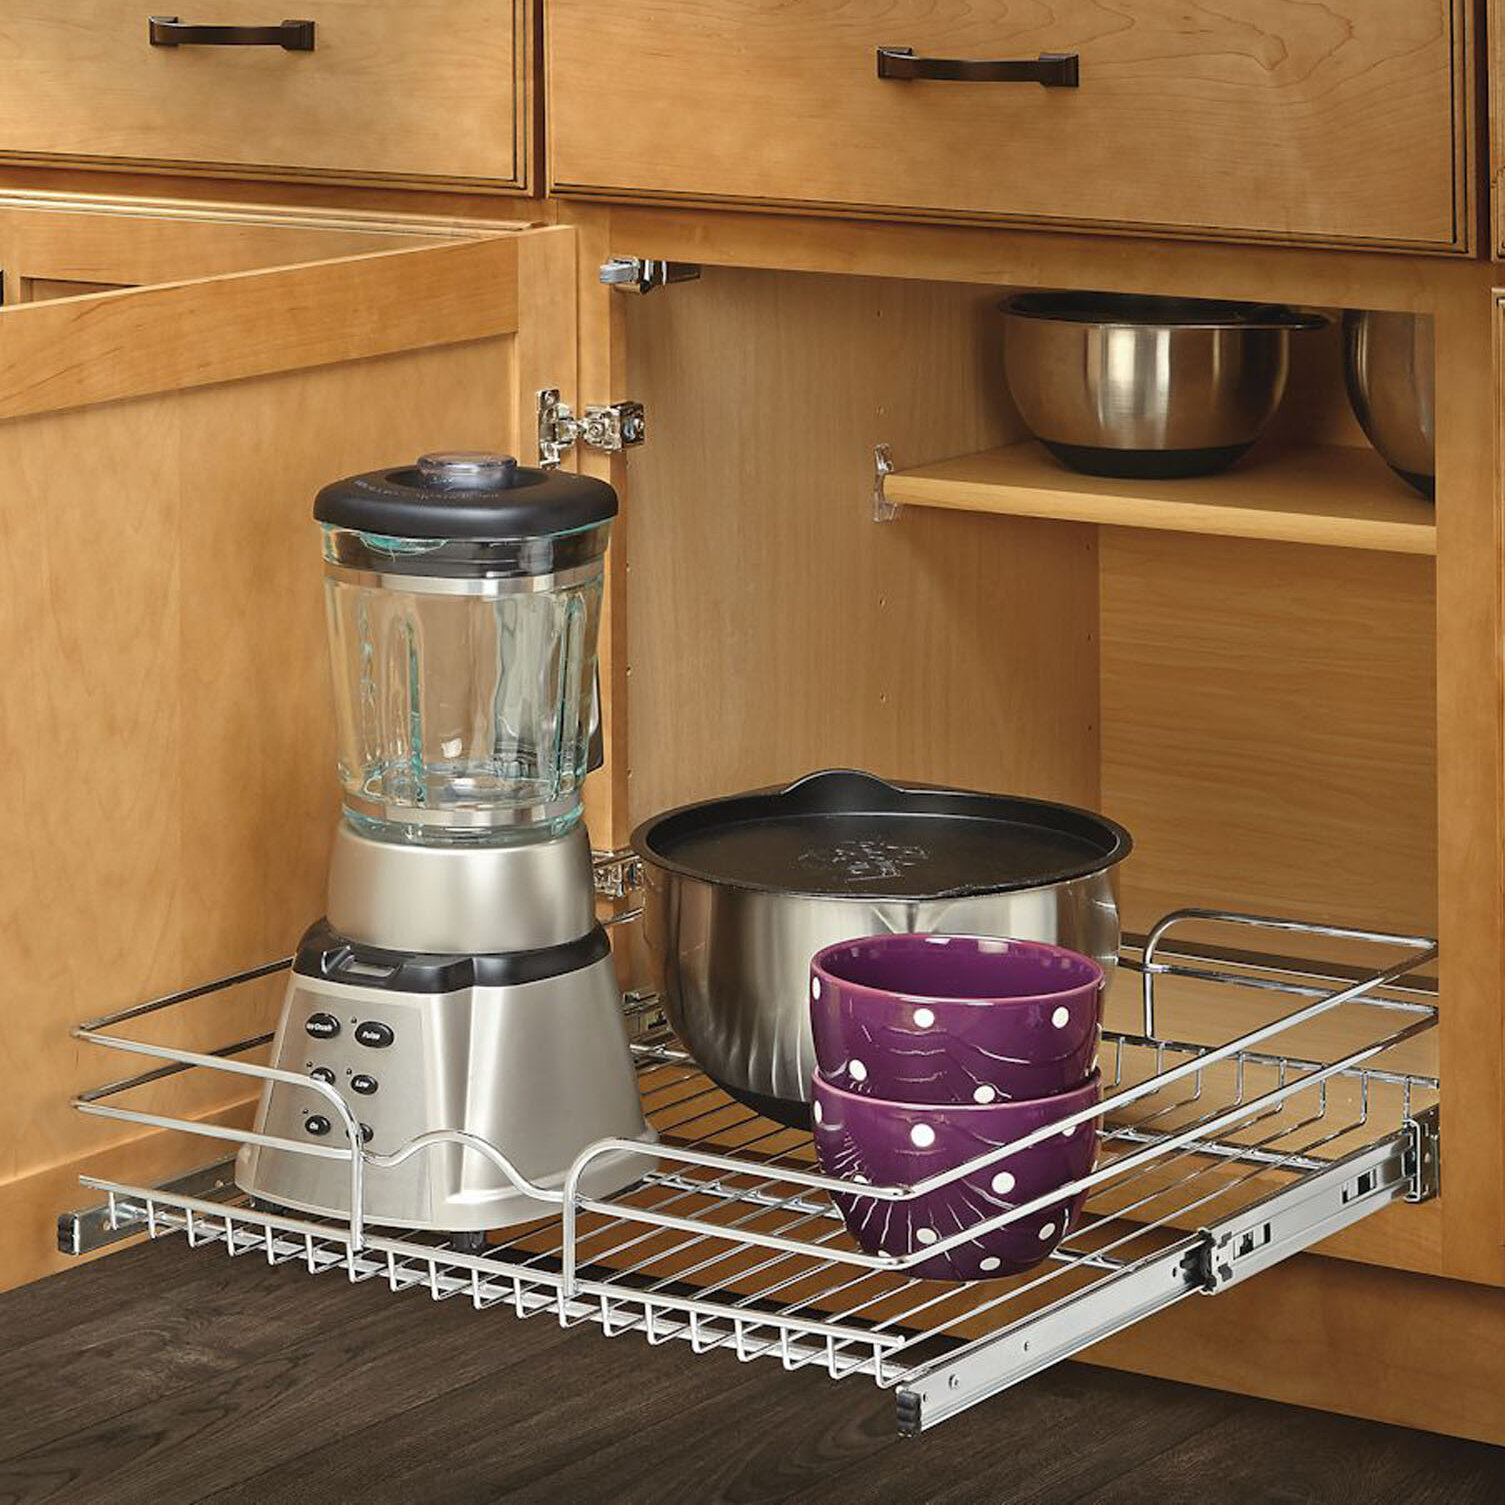 Rev A Shelf 21 X 22 Roll Out Wire Basket Cabinet Organizer Rack Reviews Wayfair